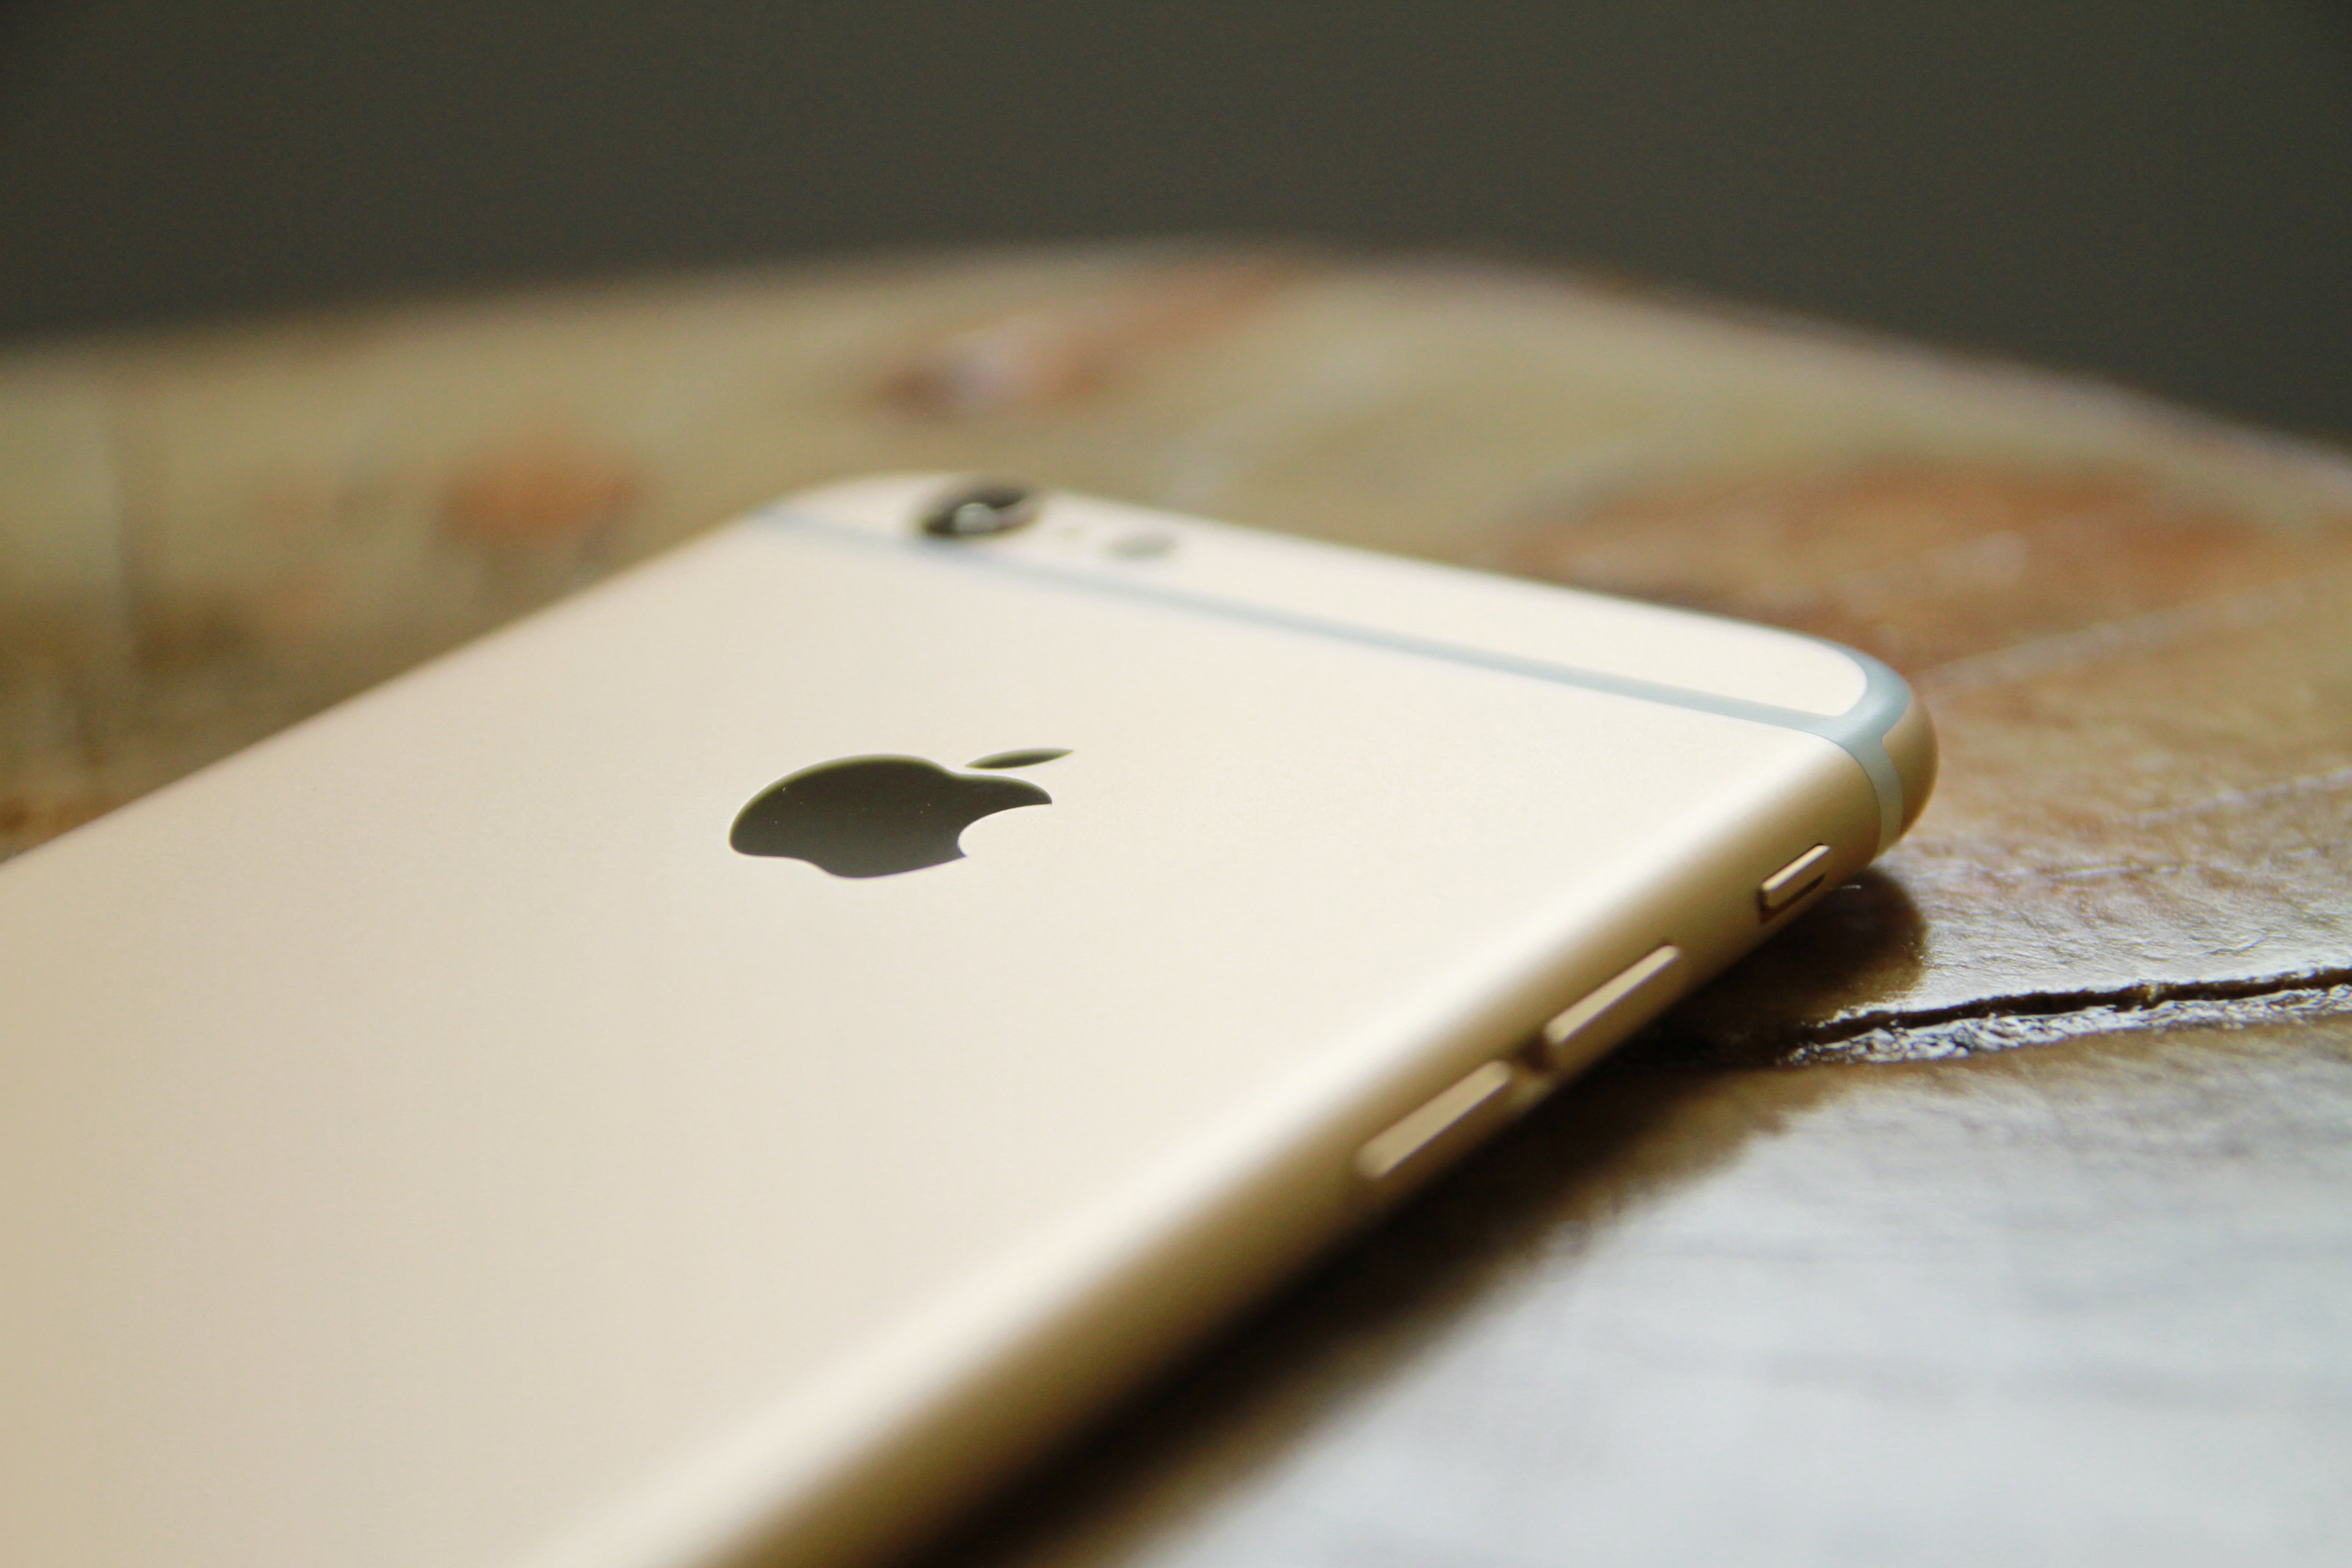 Apple sold one billion iPhones